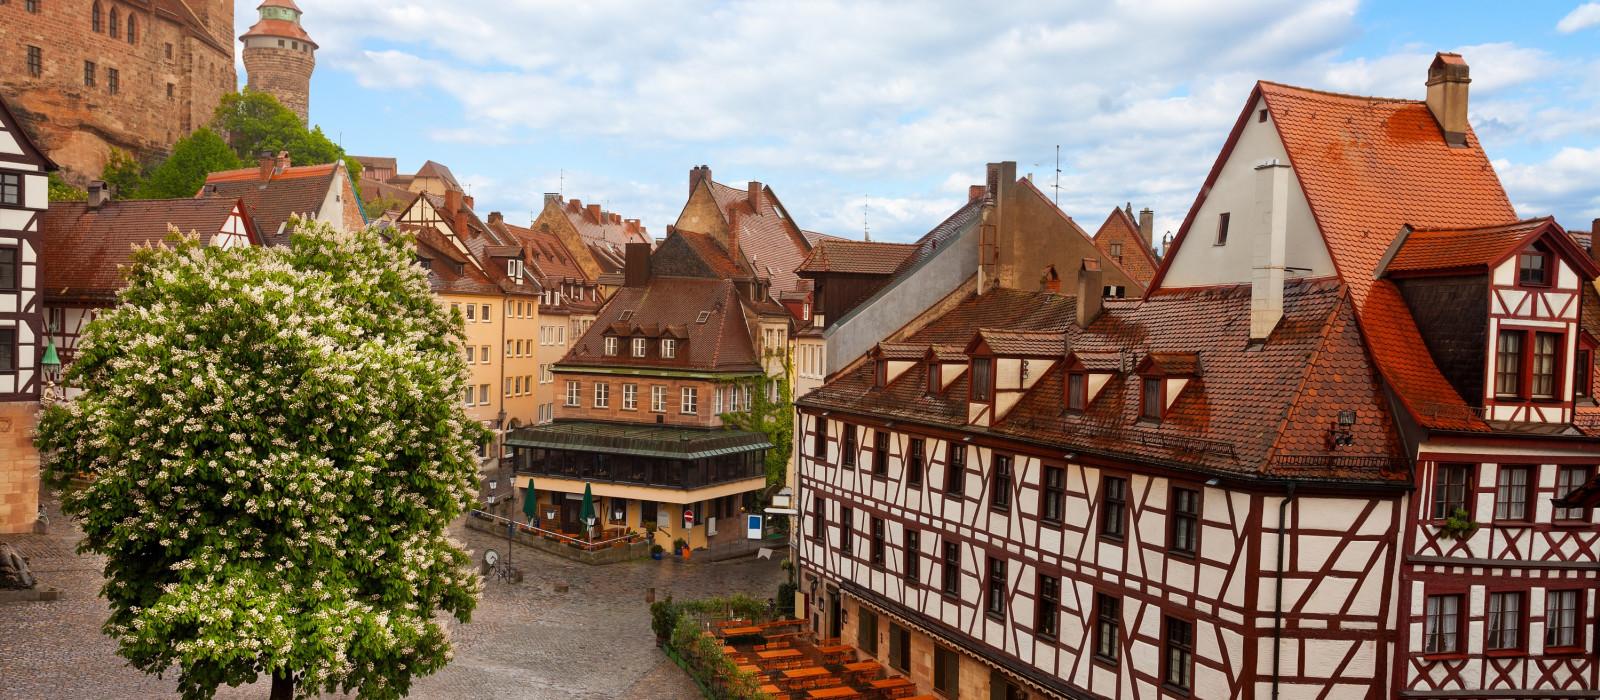 Destination Nuremberg Germany